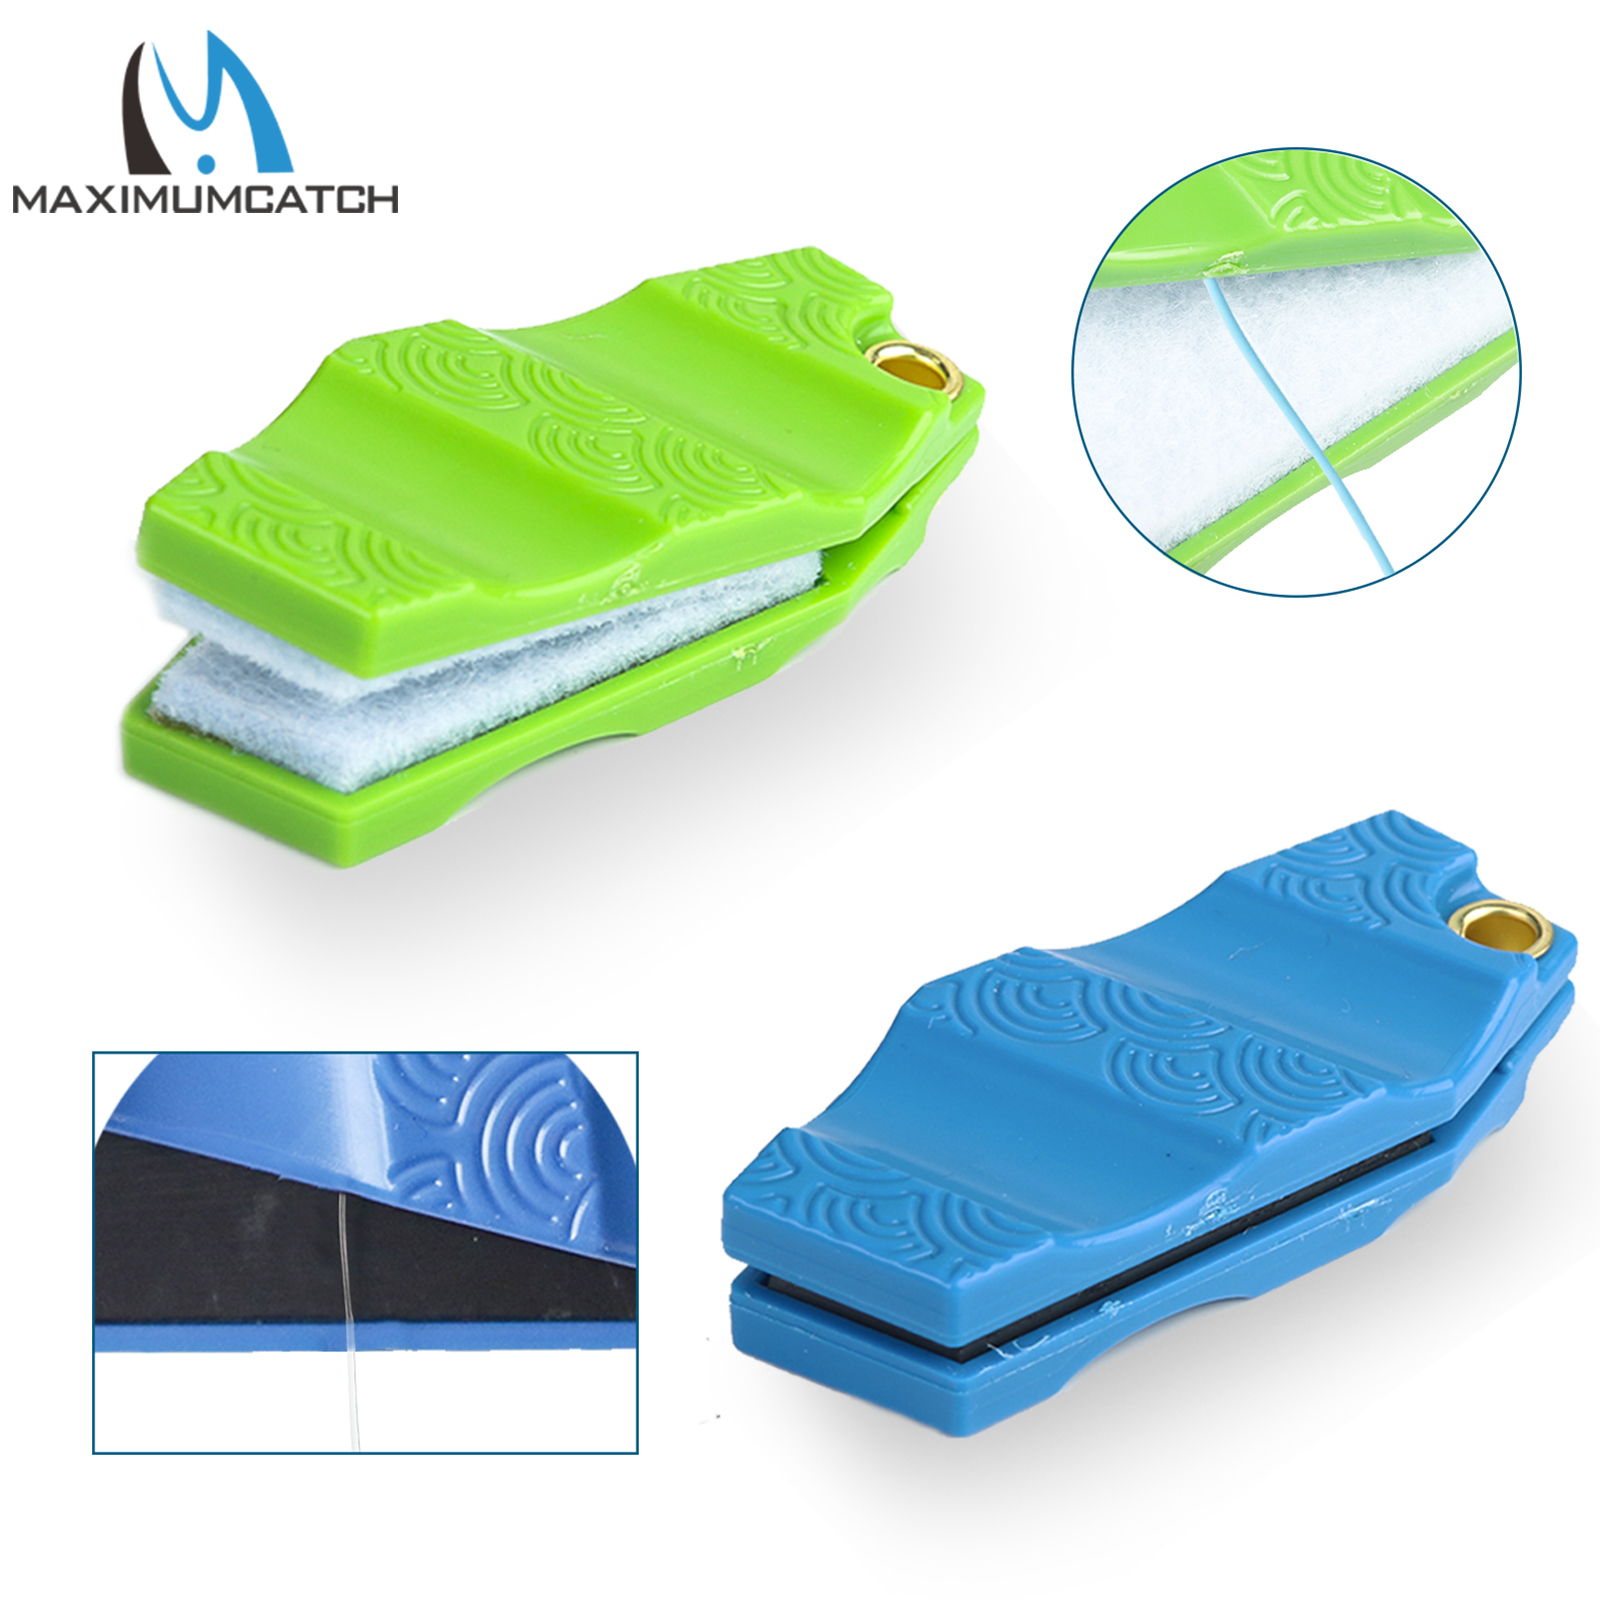 Maximumcatch Fly Fishing Leader Straightener & Line Cleaner Hard Plastic Fishing Accessory